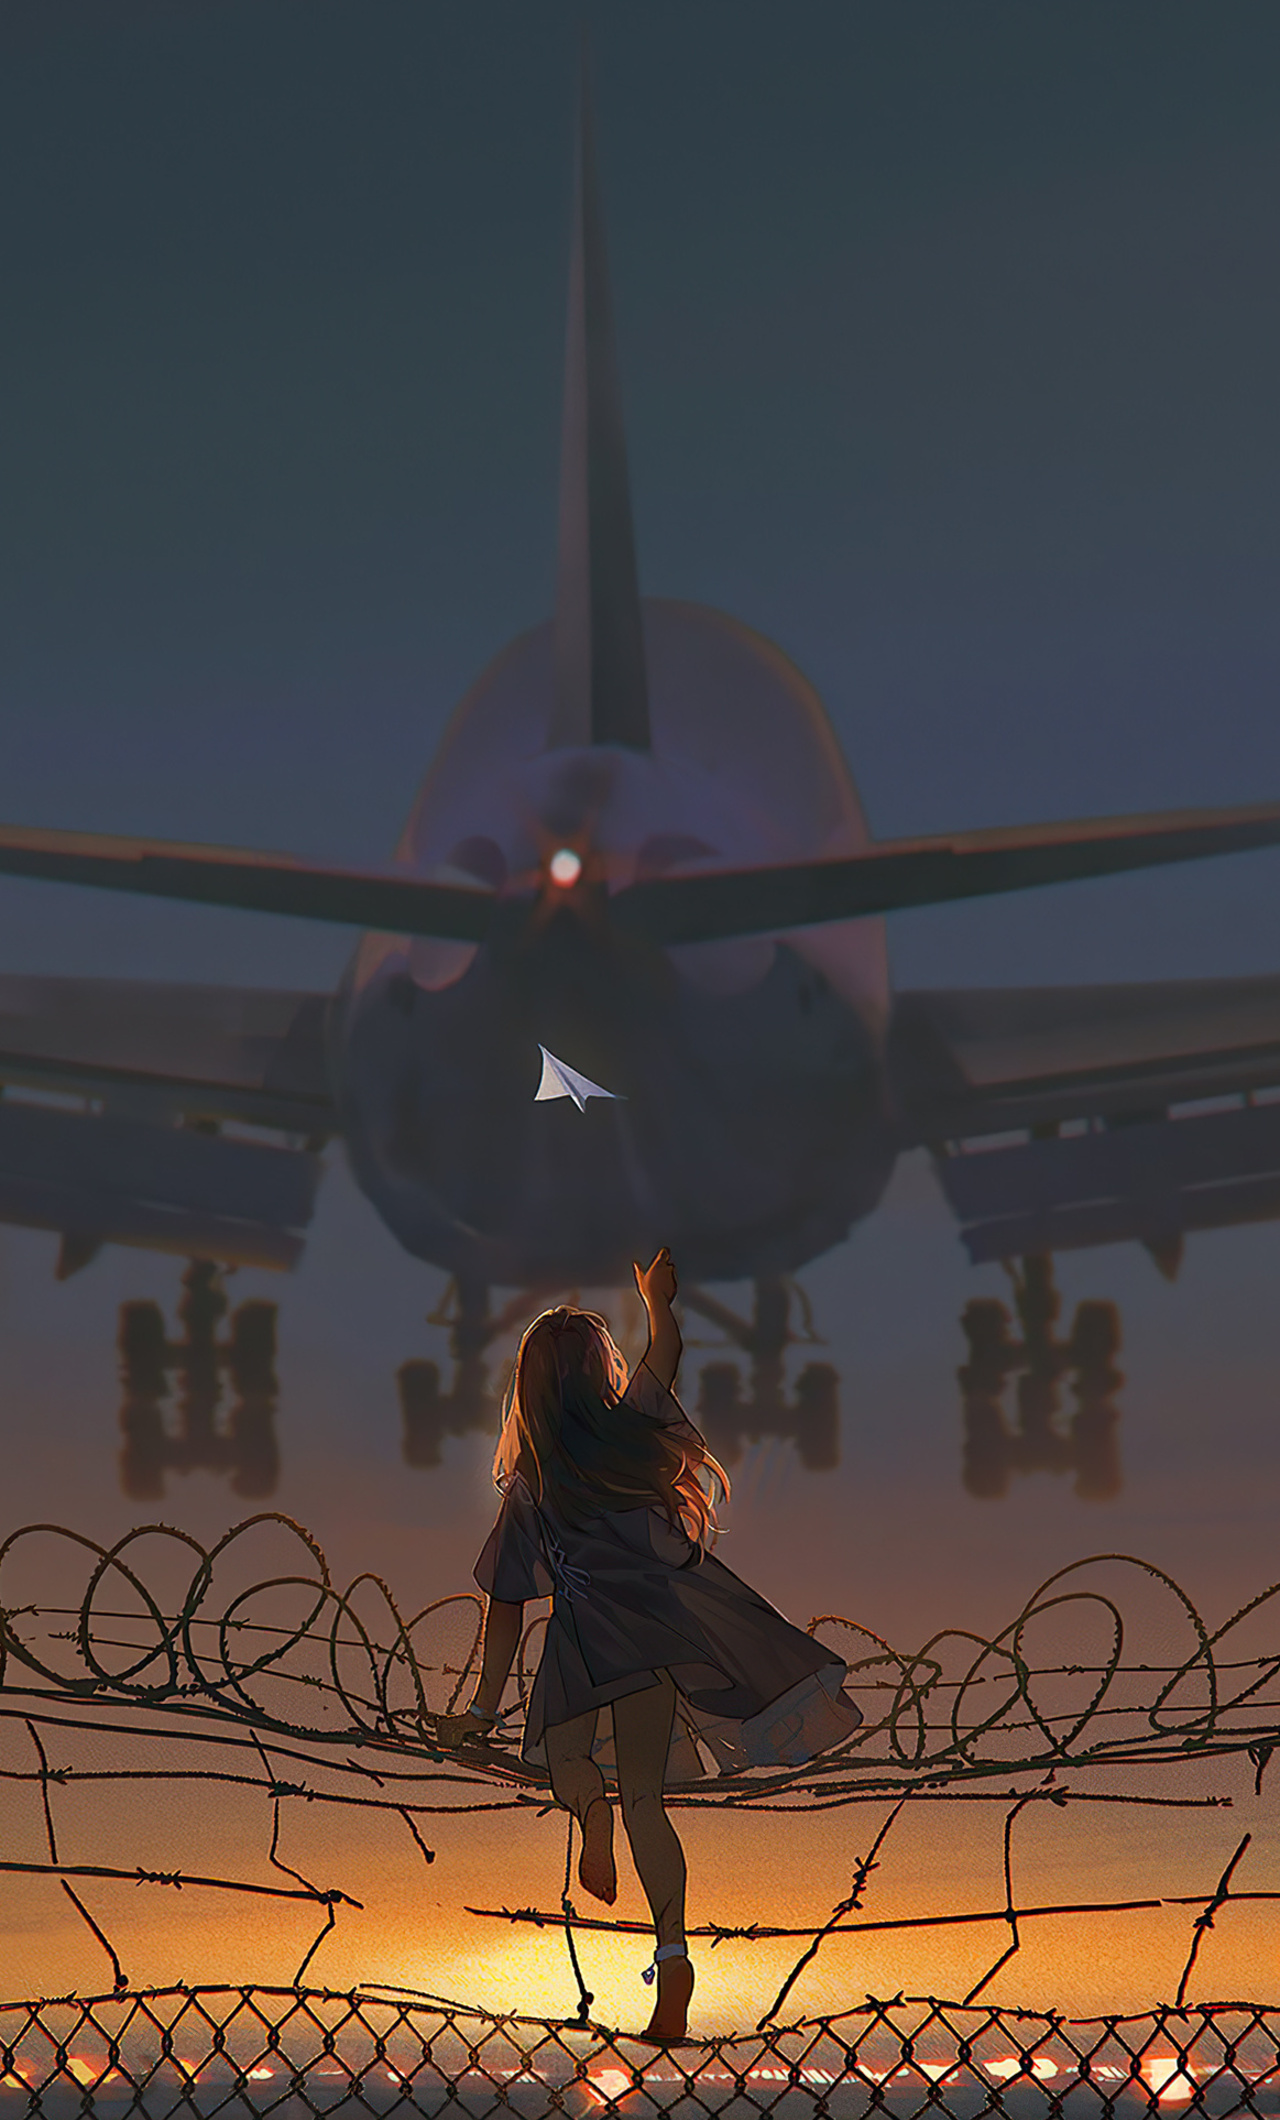 catching-the-flight-4k-d5.jpg